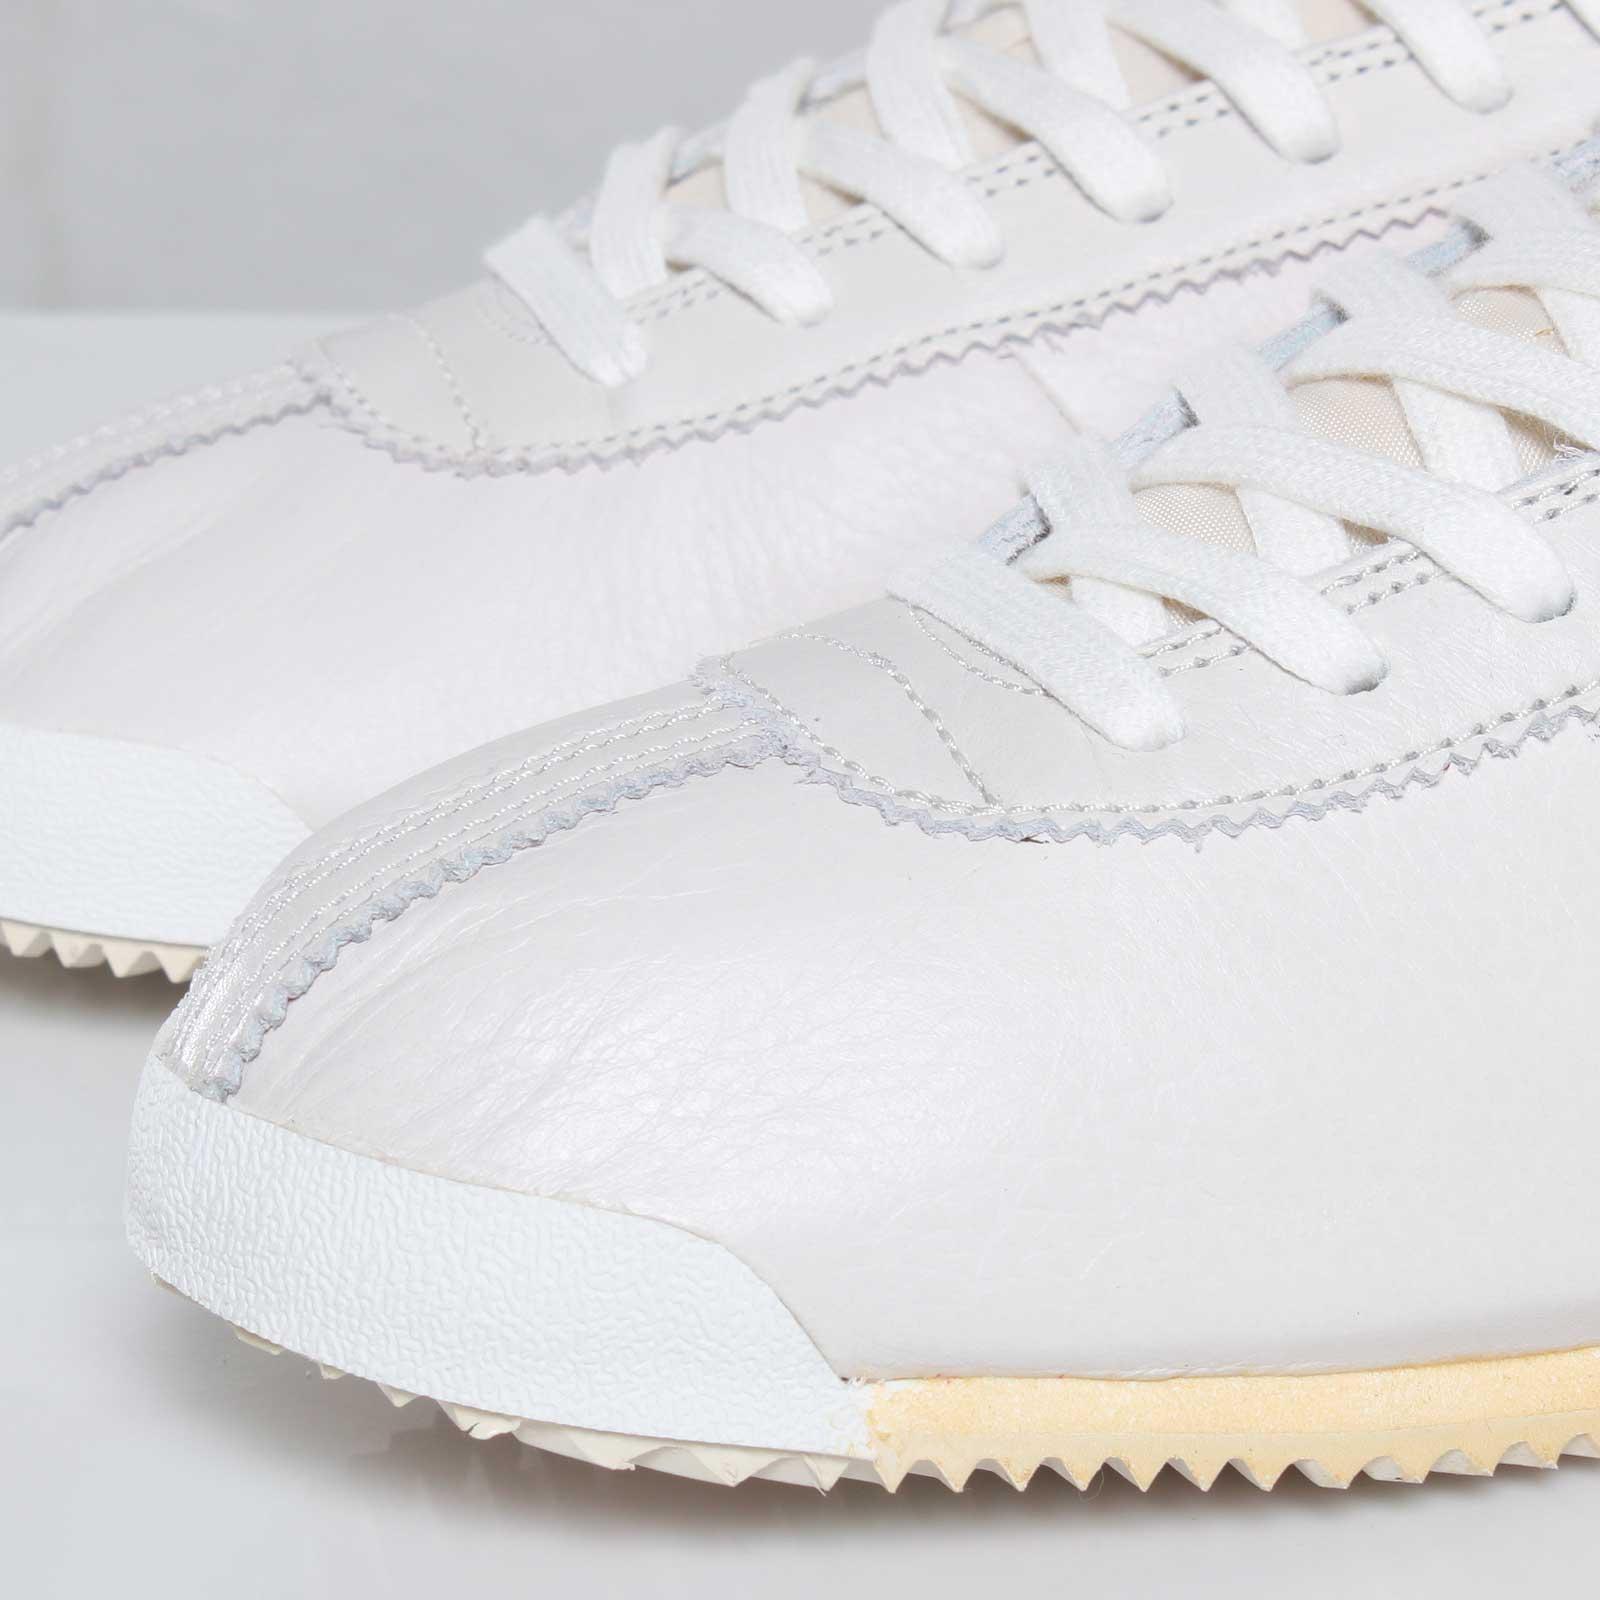 sale retailer 4876e 3ecfa Nike Cortez Classic OG Leather QS - 109142 - Sneakersnstuff ...